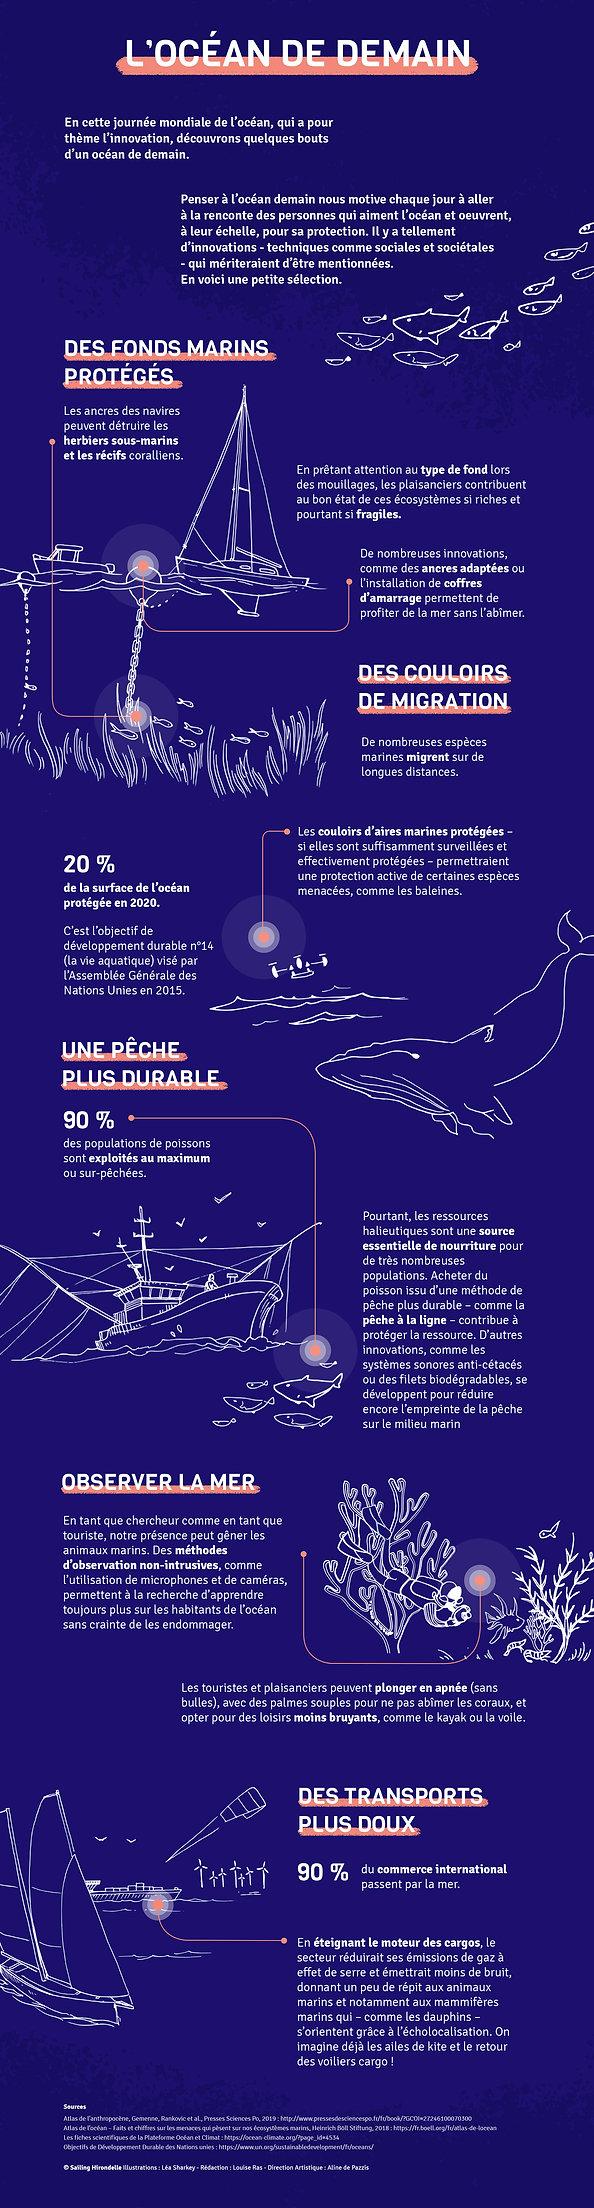 infog_ocean-de-demain.jpg